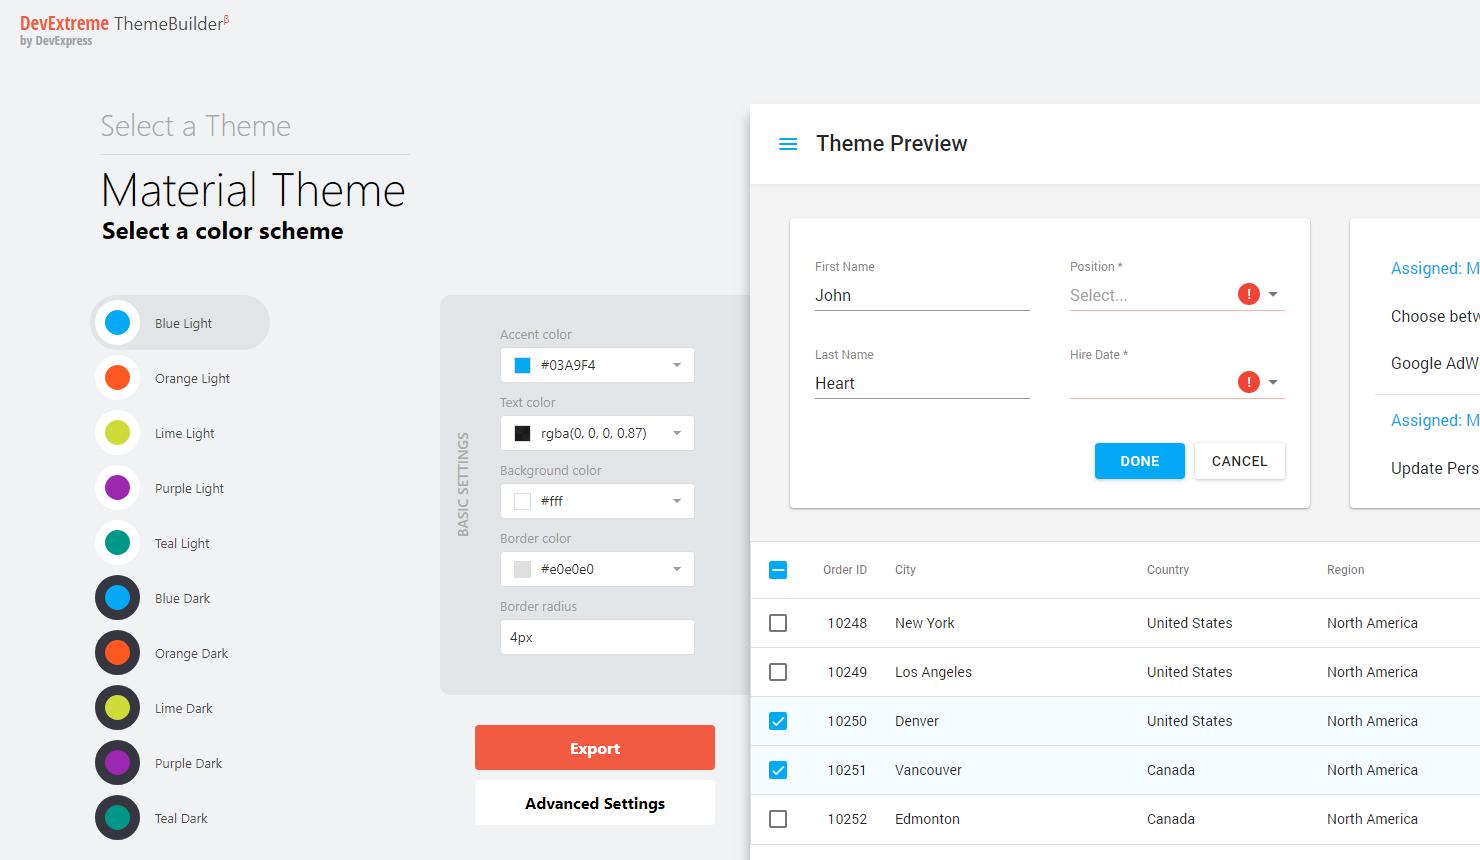 DevExtreme – New ThemeBuilder